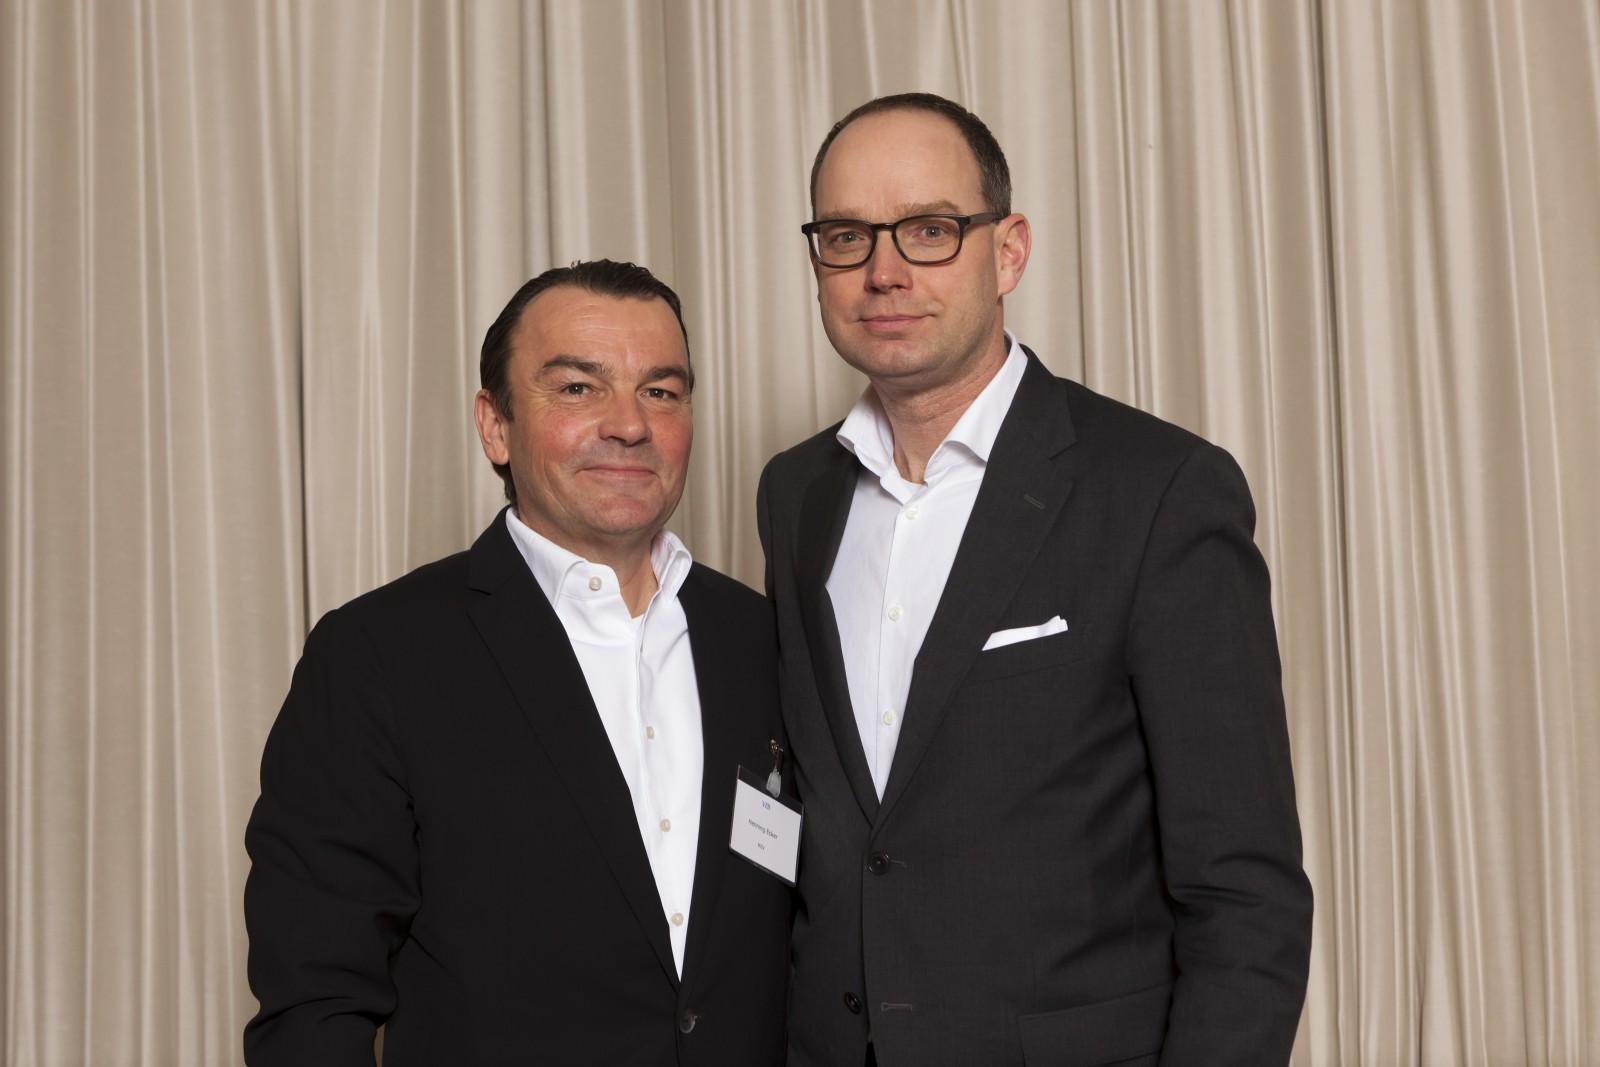 Henning Ecker, MZV; Dr. Holger Feist, Messe München